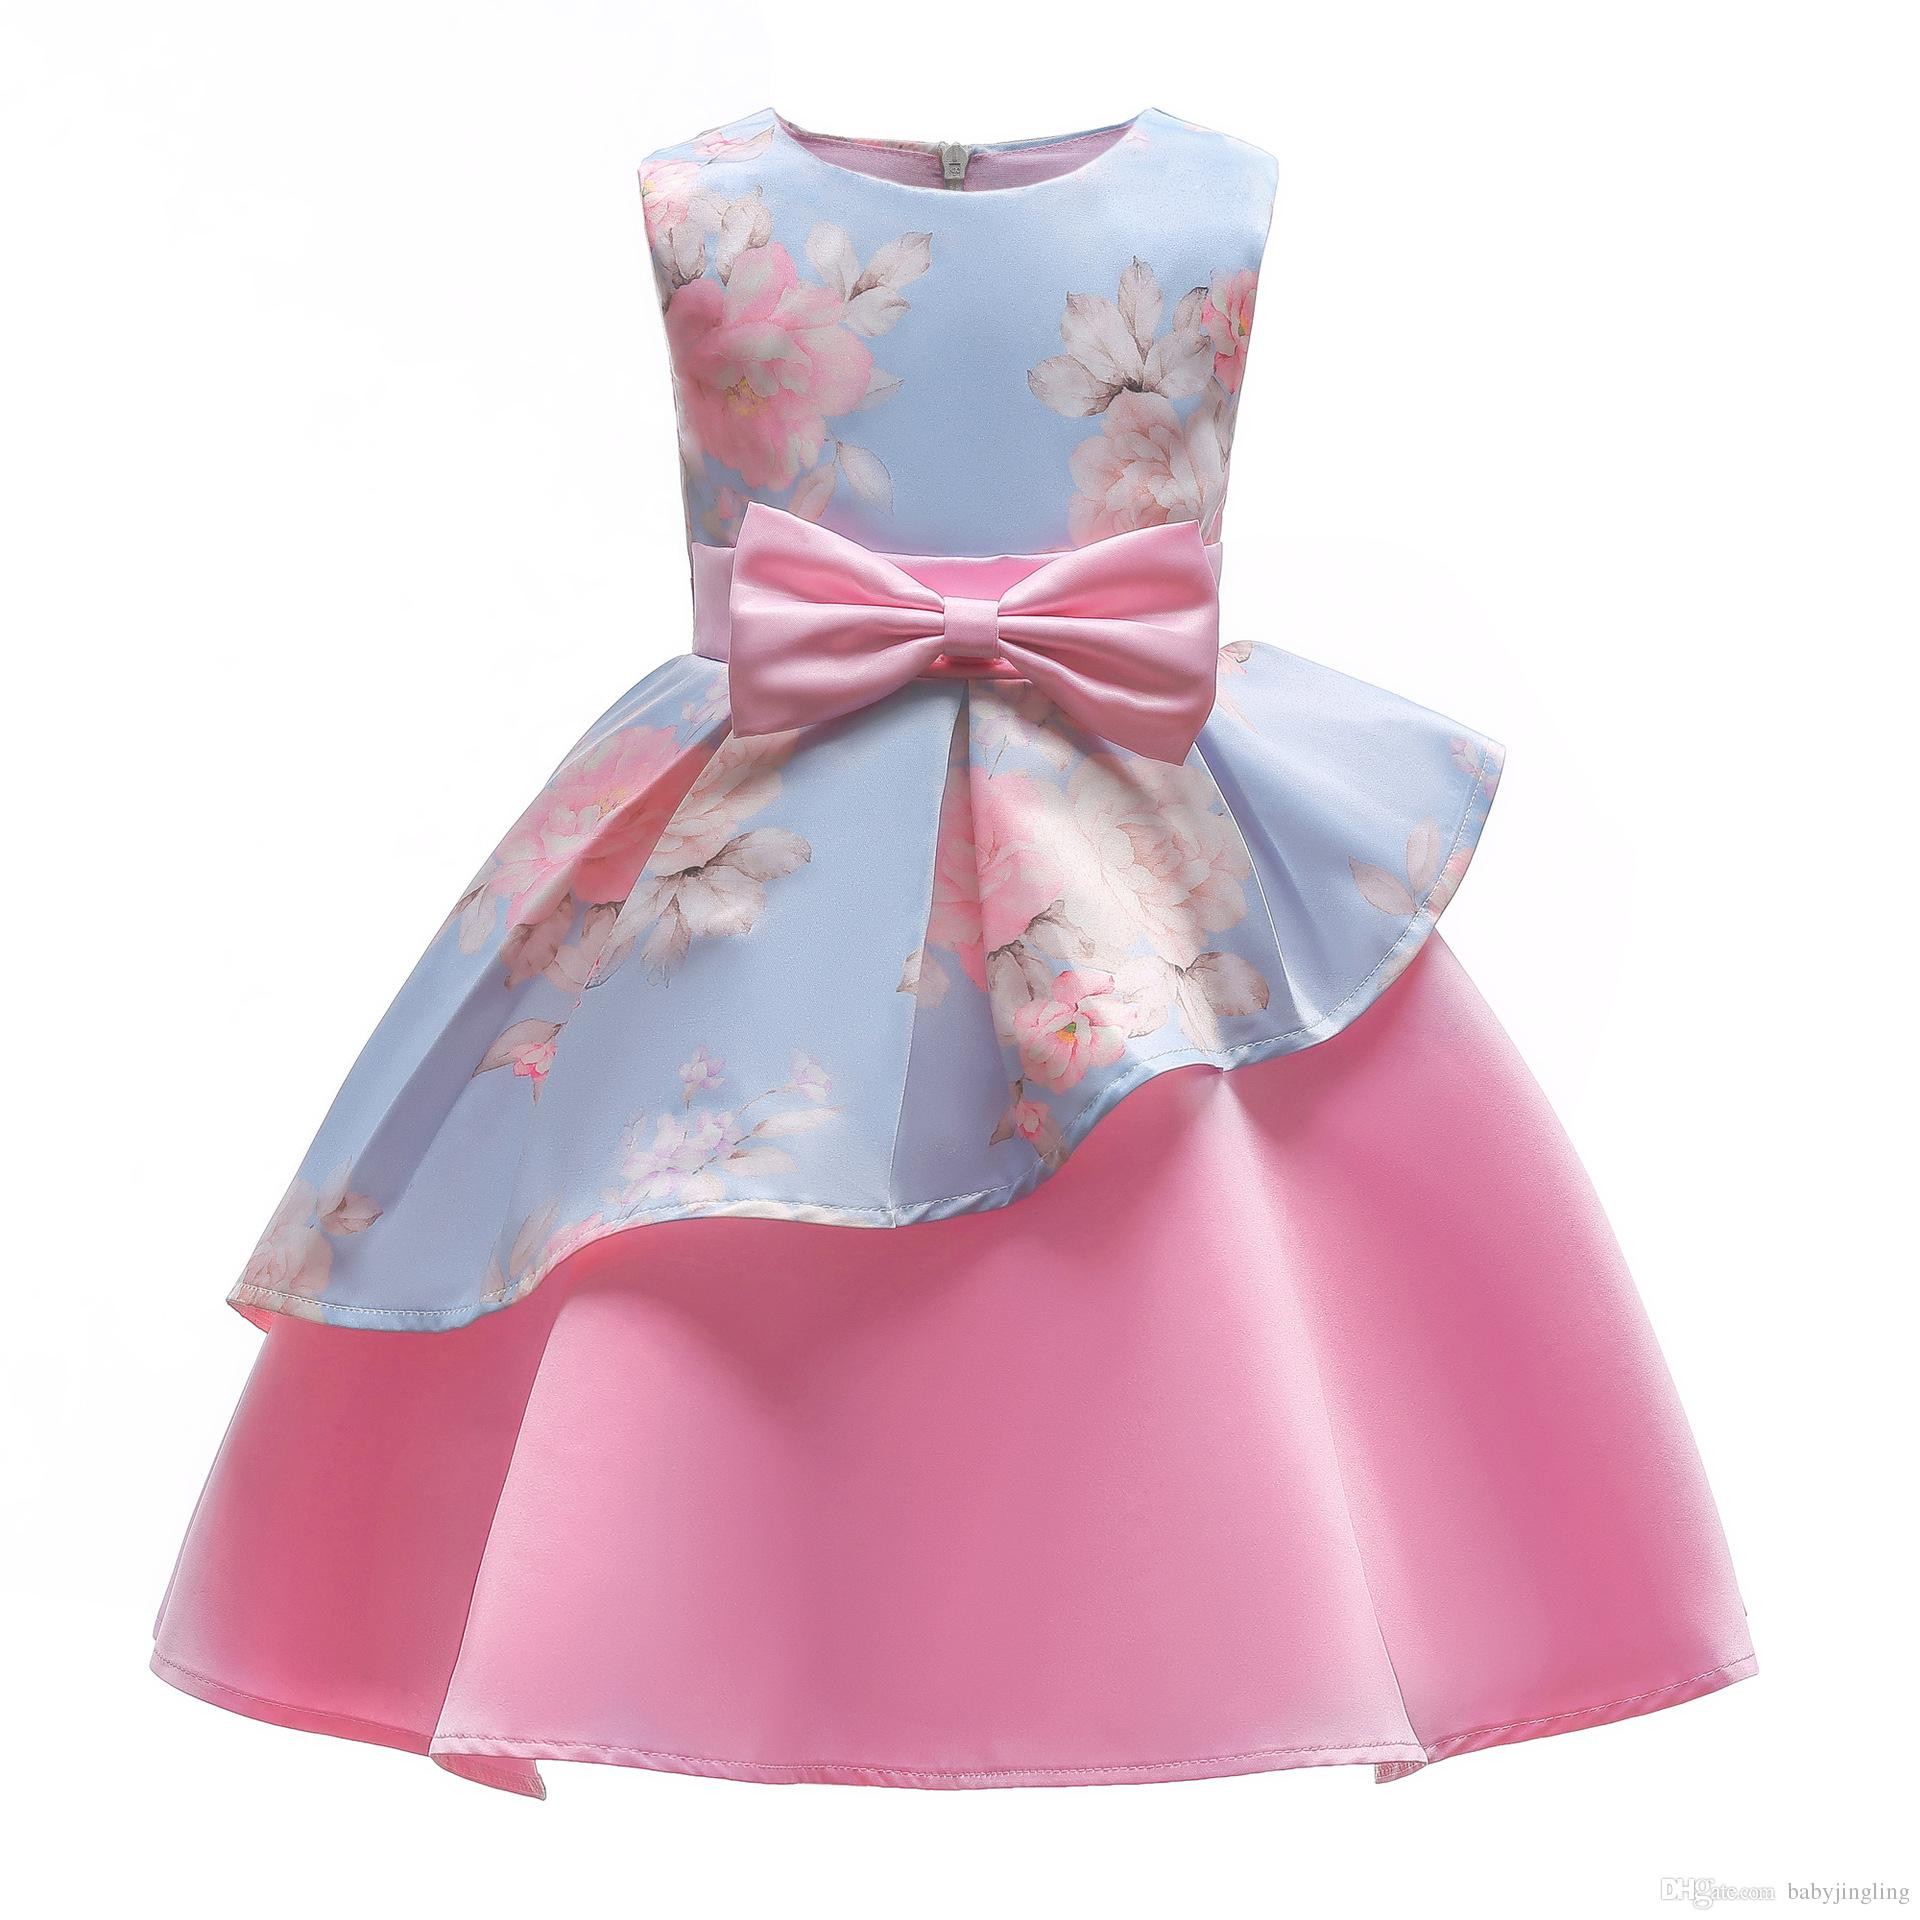 87df3cd629c63 New Elegant Girls Princess Dress Kids Party Dresses For Girls Wedding Dress  Children Christmas Dress For Girls Costume 8 10 Year